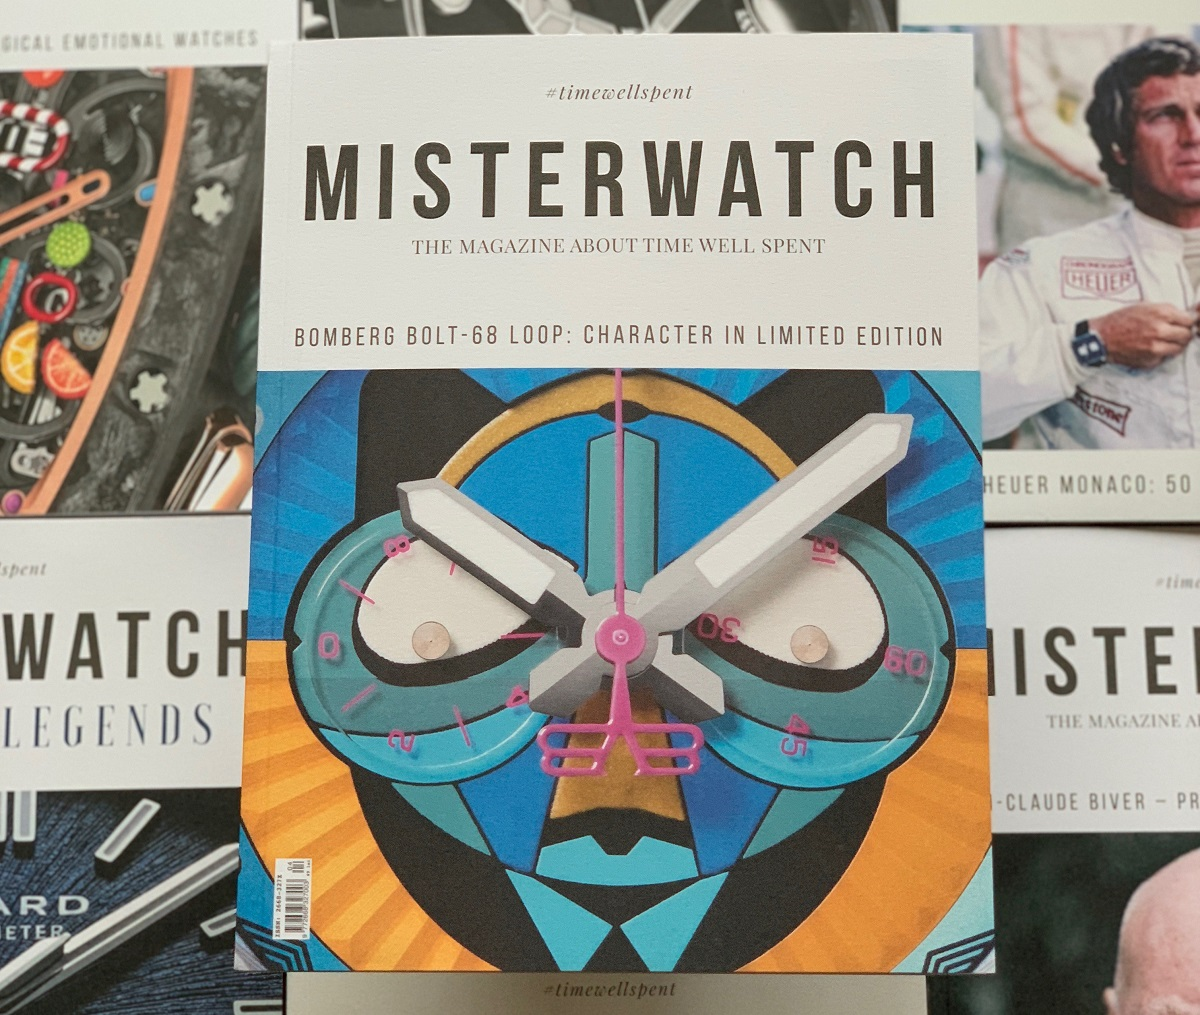 coperta revistei MisterWatch